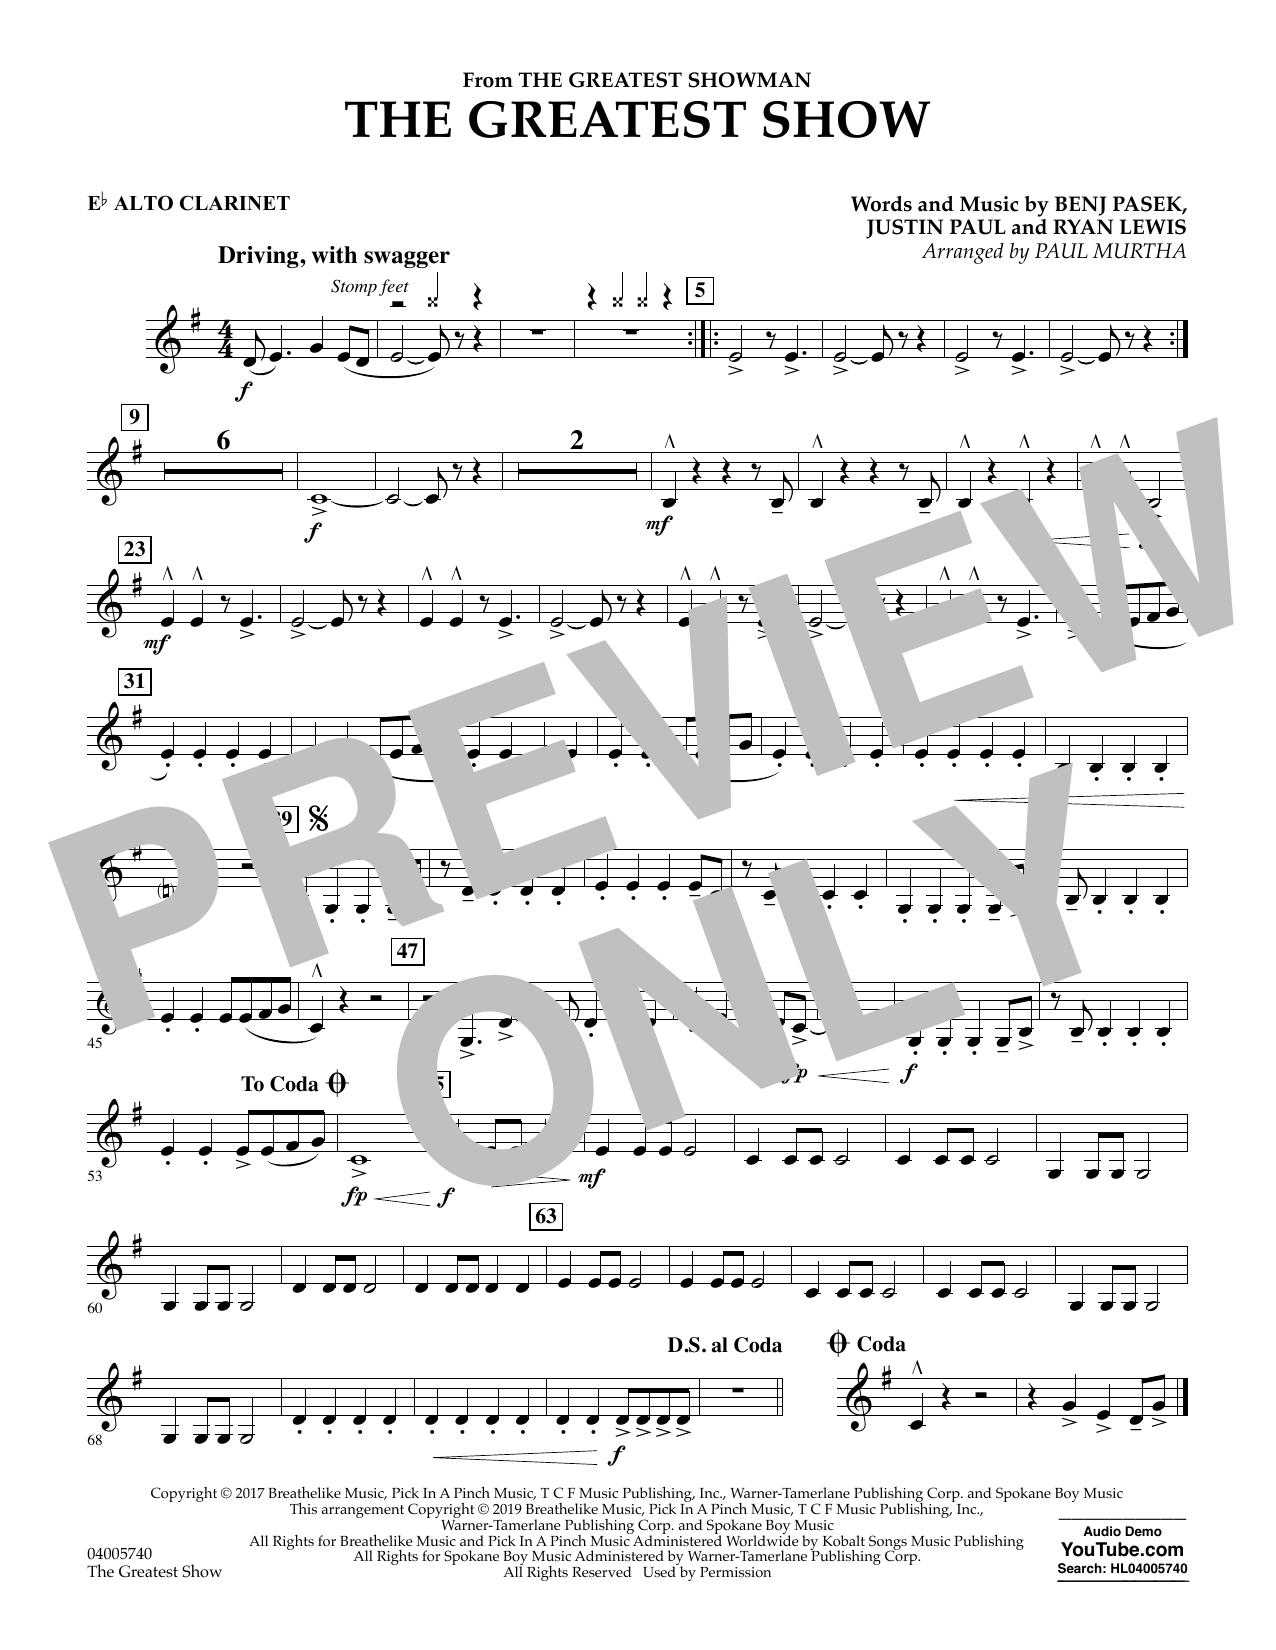 The Greatest Show  (arr. Paul Murtha) - Eb Alto Clarinet (Concert Band)